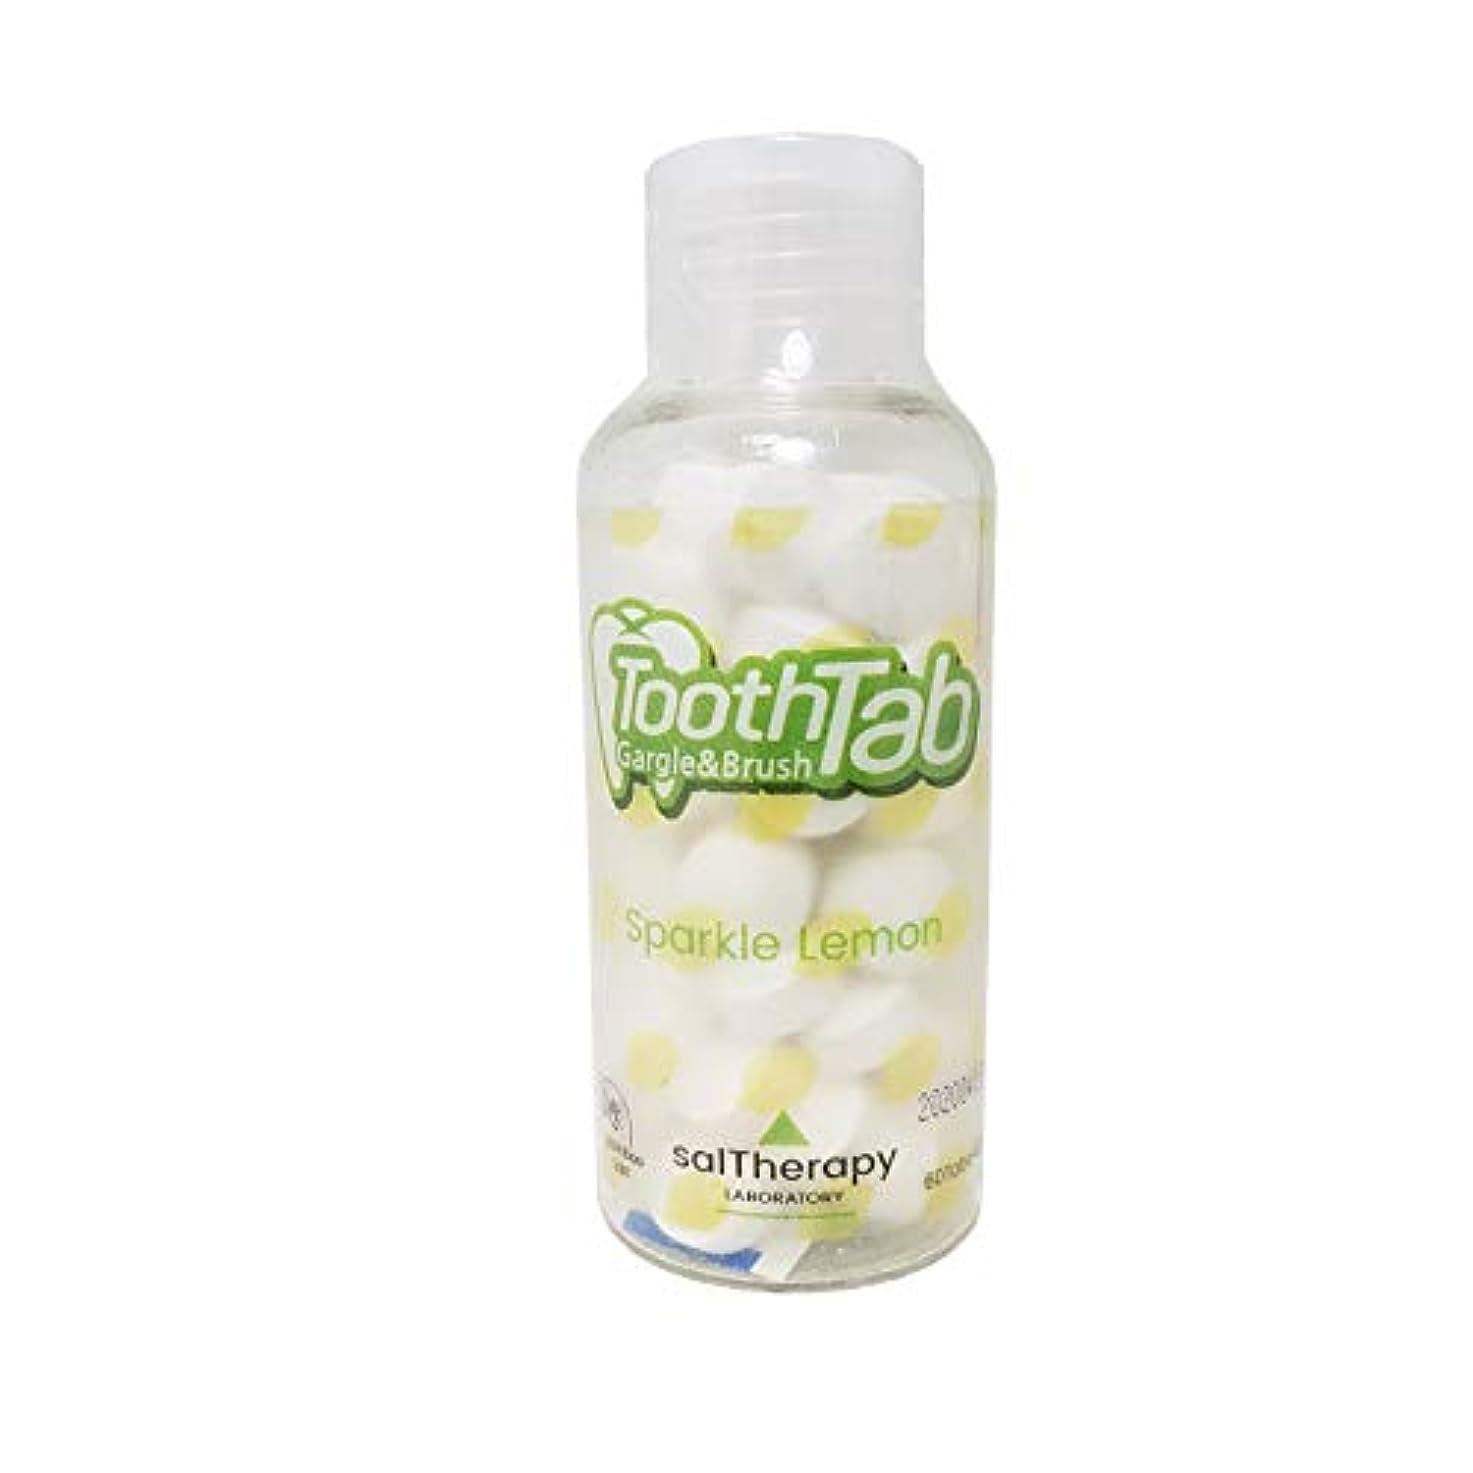 SalTherapy 歯磨き粉 固体タブレット 60個入 (Sparkle Lemon)